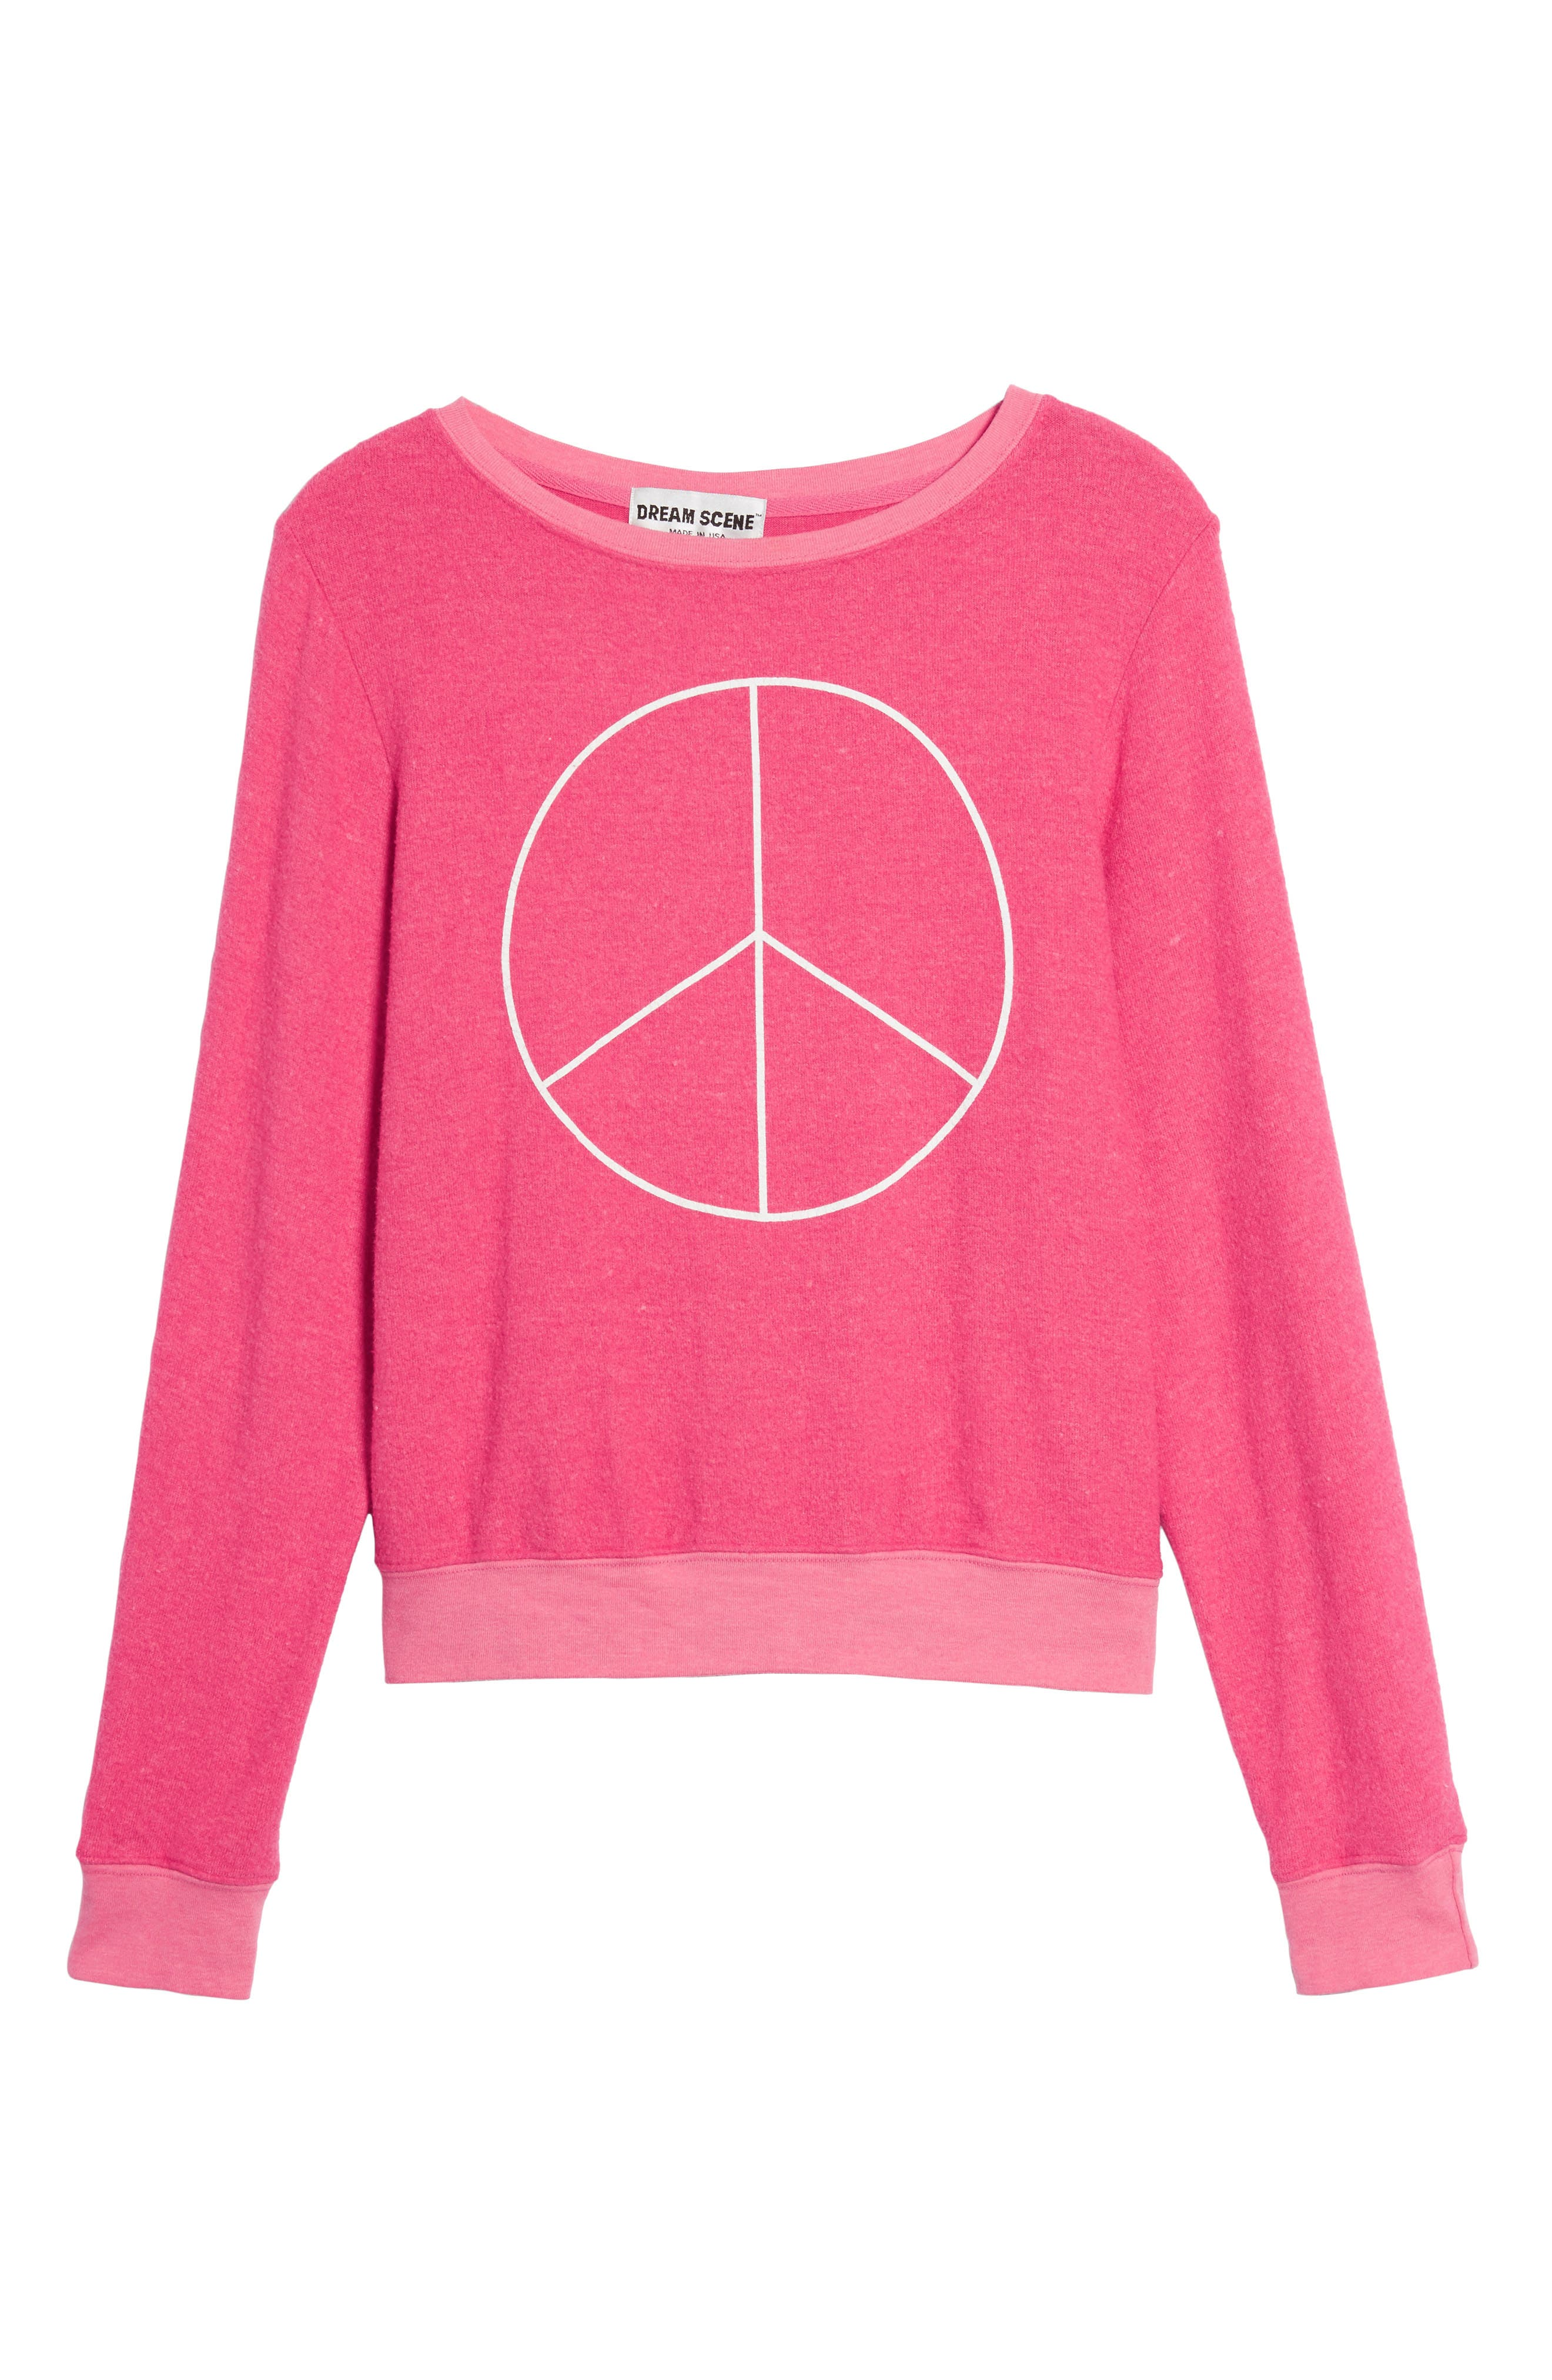 Peace Sweatshirt,                             Alternate thumbnail 6, color,                             670